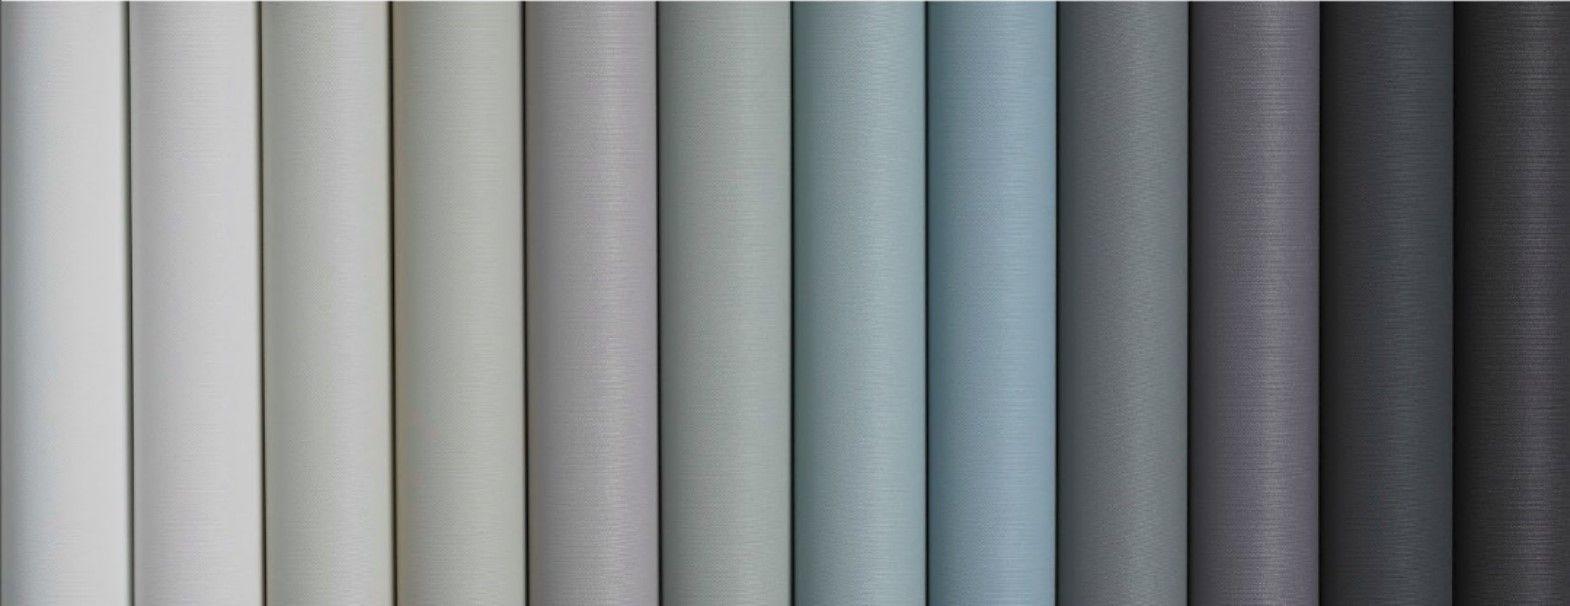 Dulux Most Popular Paint Colours Now Have Roller Blinds